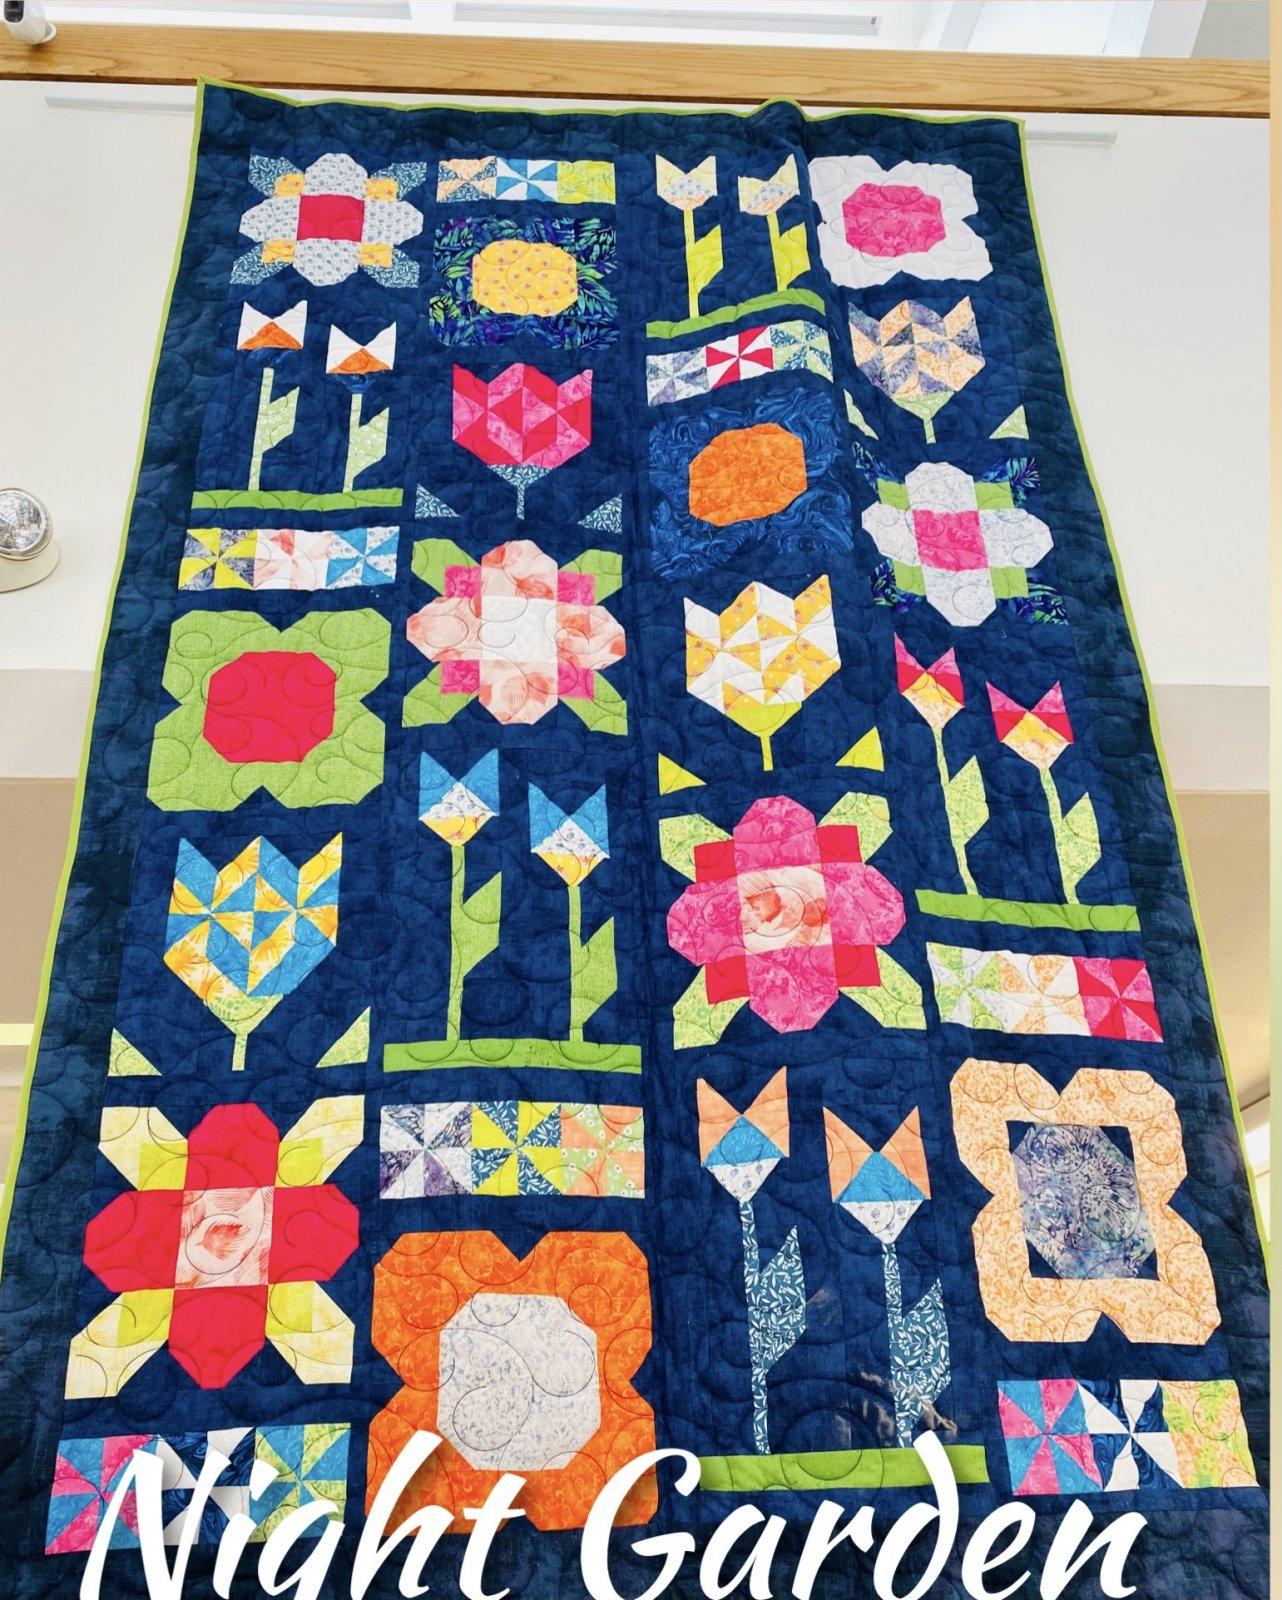 Night Garden Quilt Kit